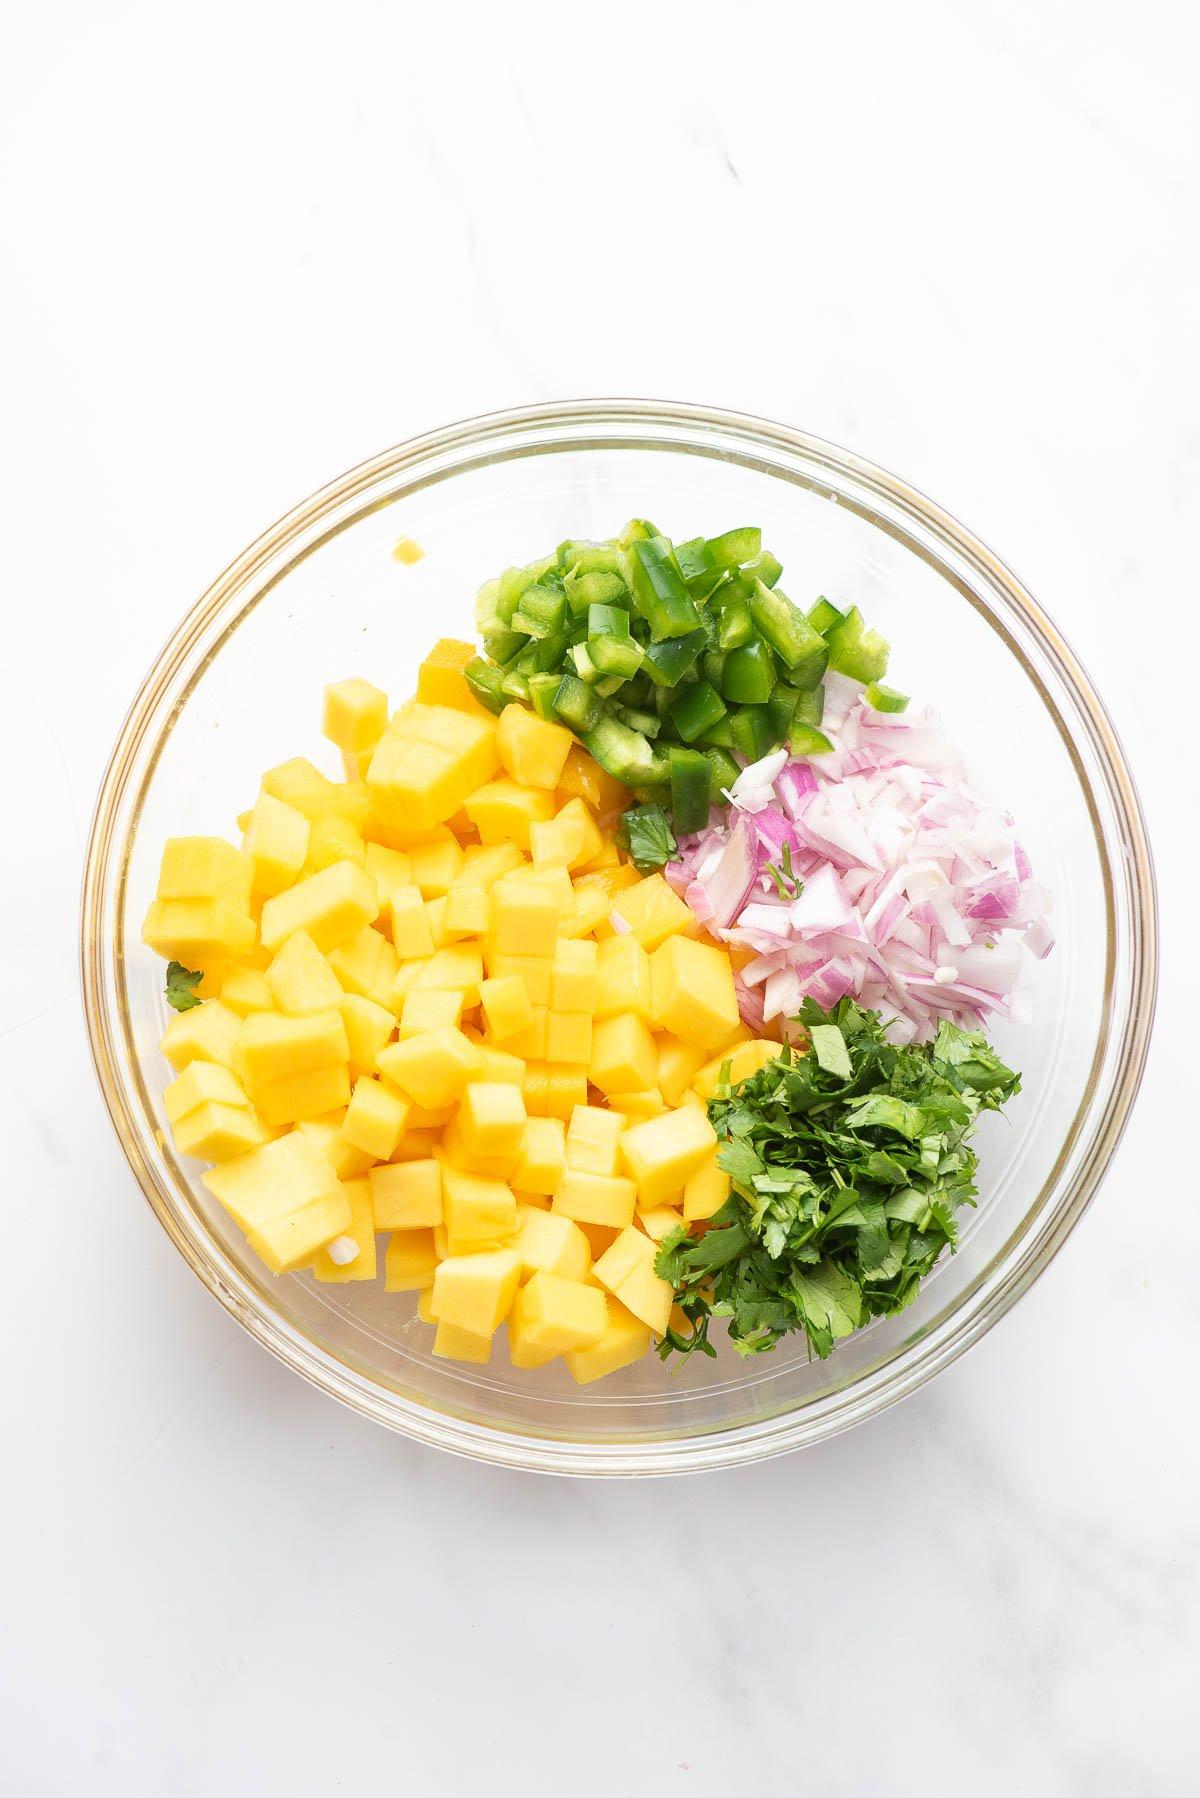 mango salsa ingredients in bowl